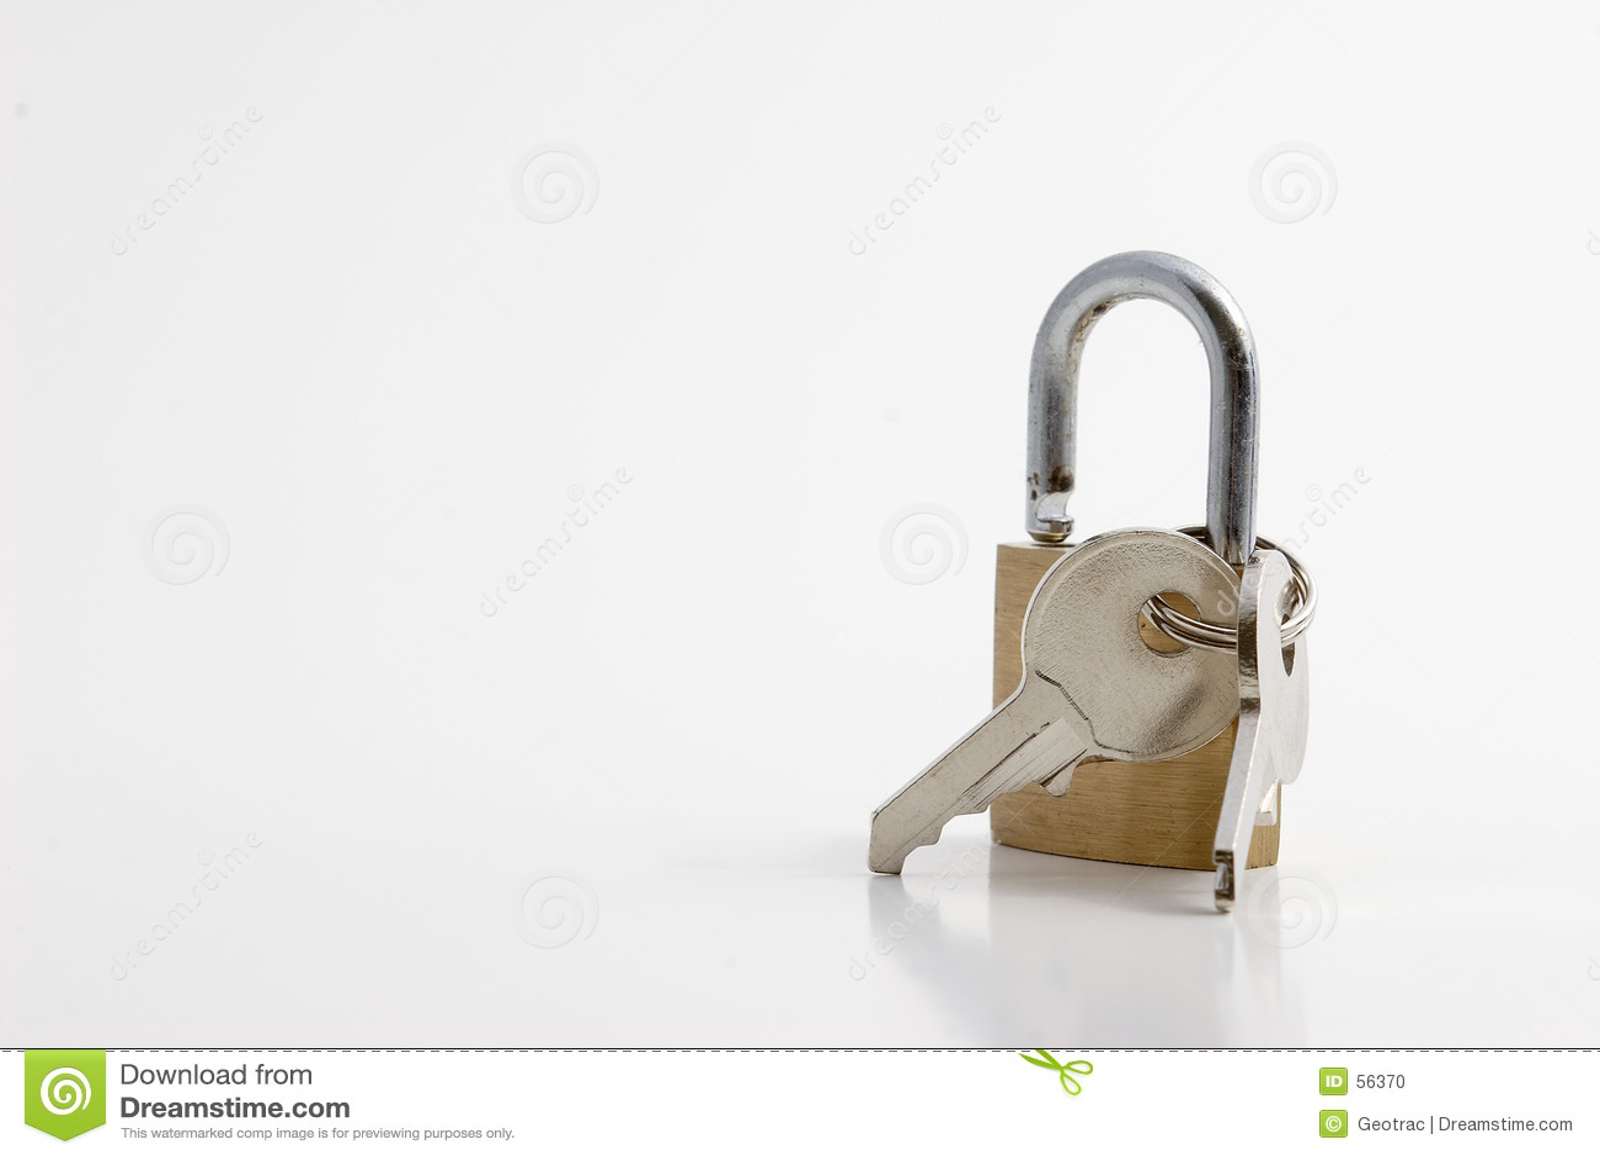 Download κλείδωμα πλήκτρων στοκ εικόνες. εικόνα από ασφάλεια, bronte - 56370